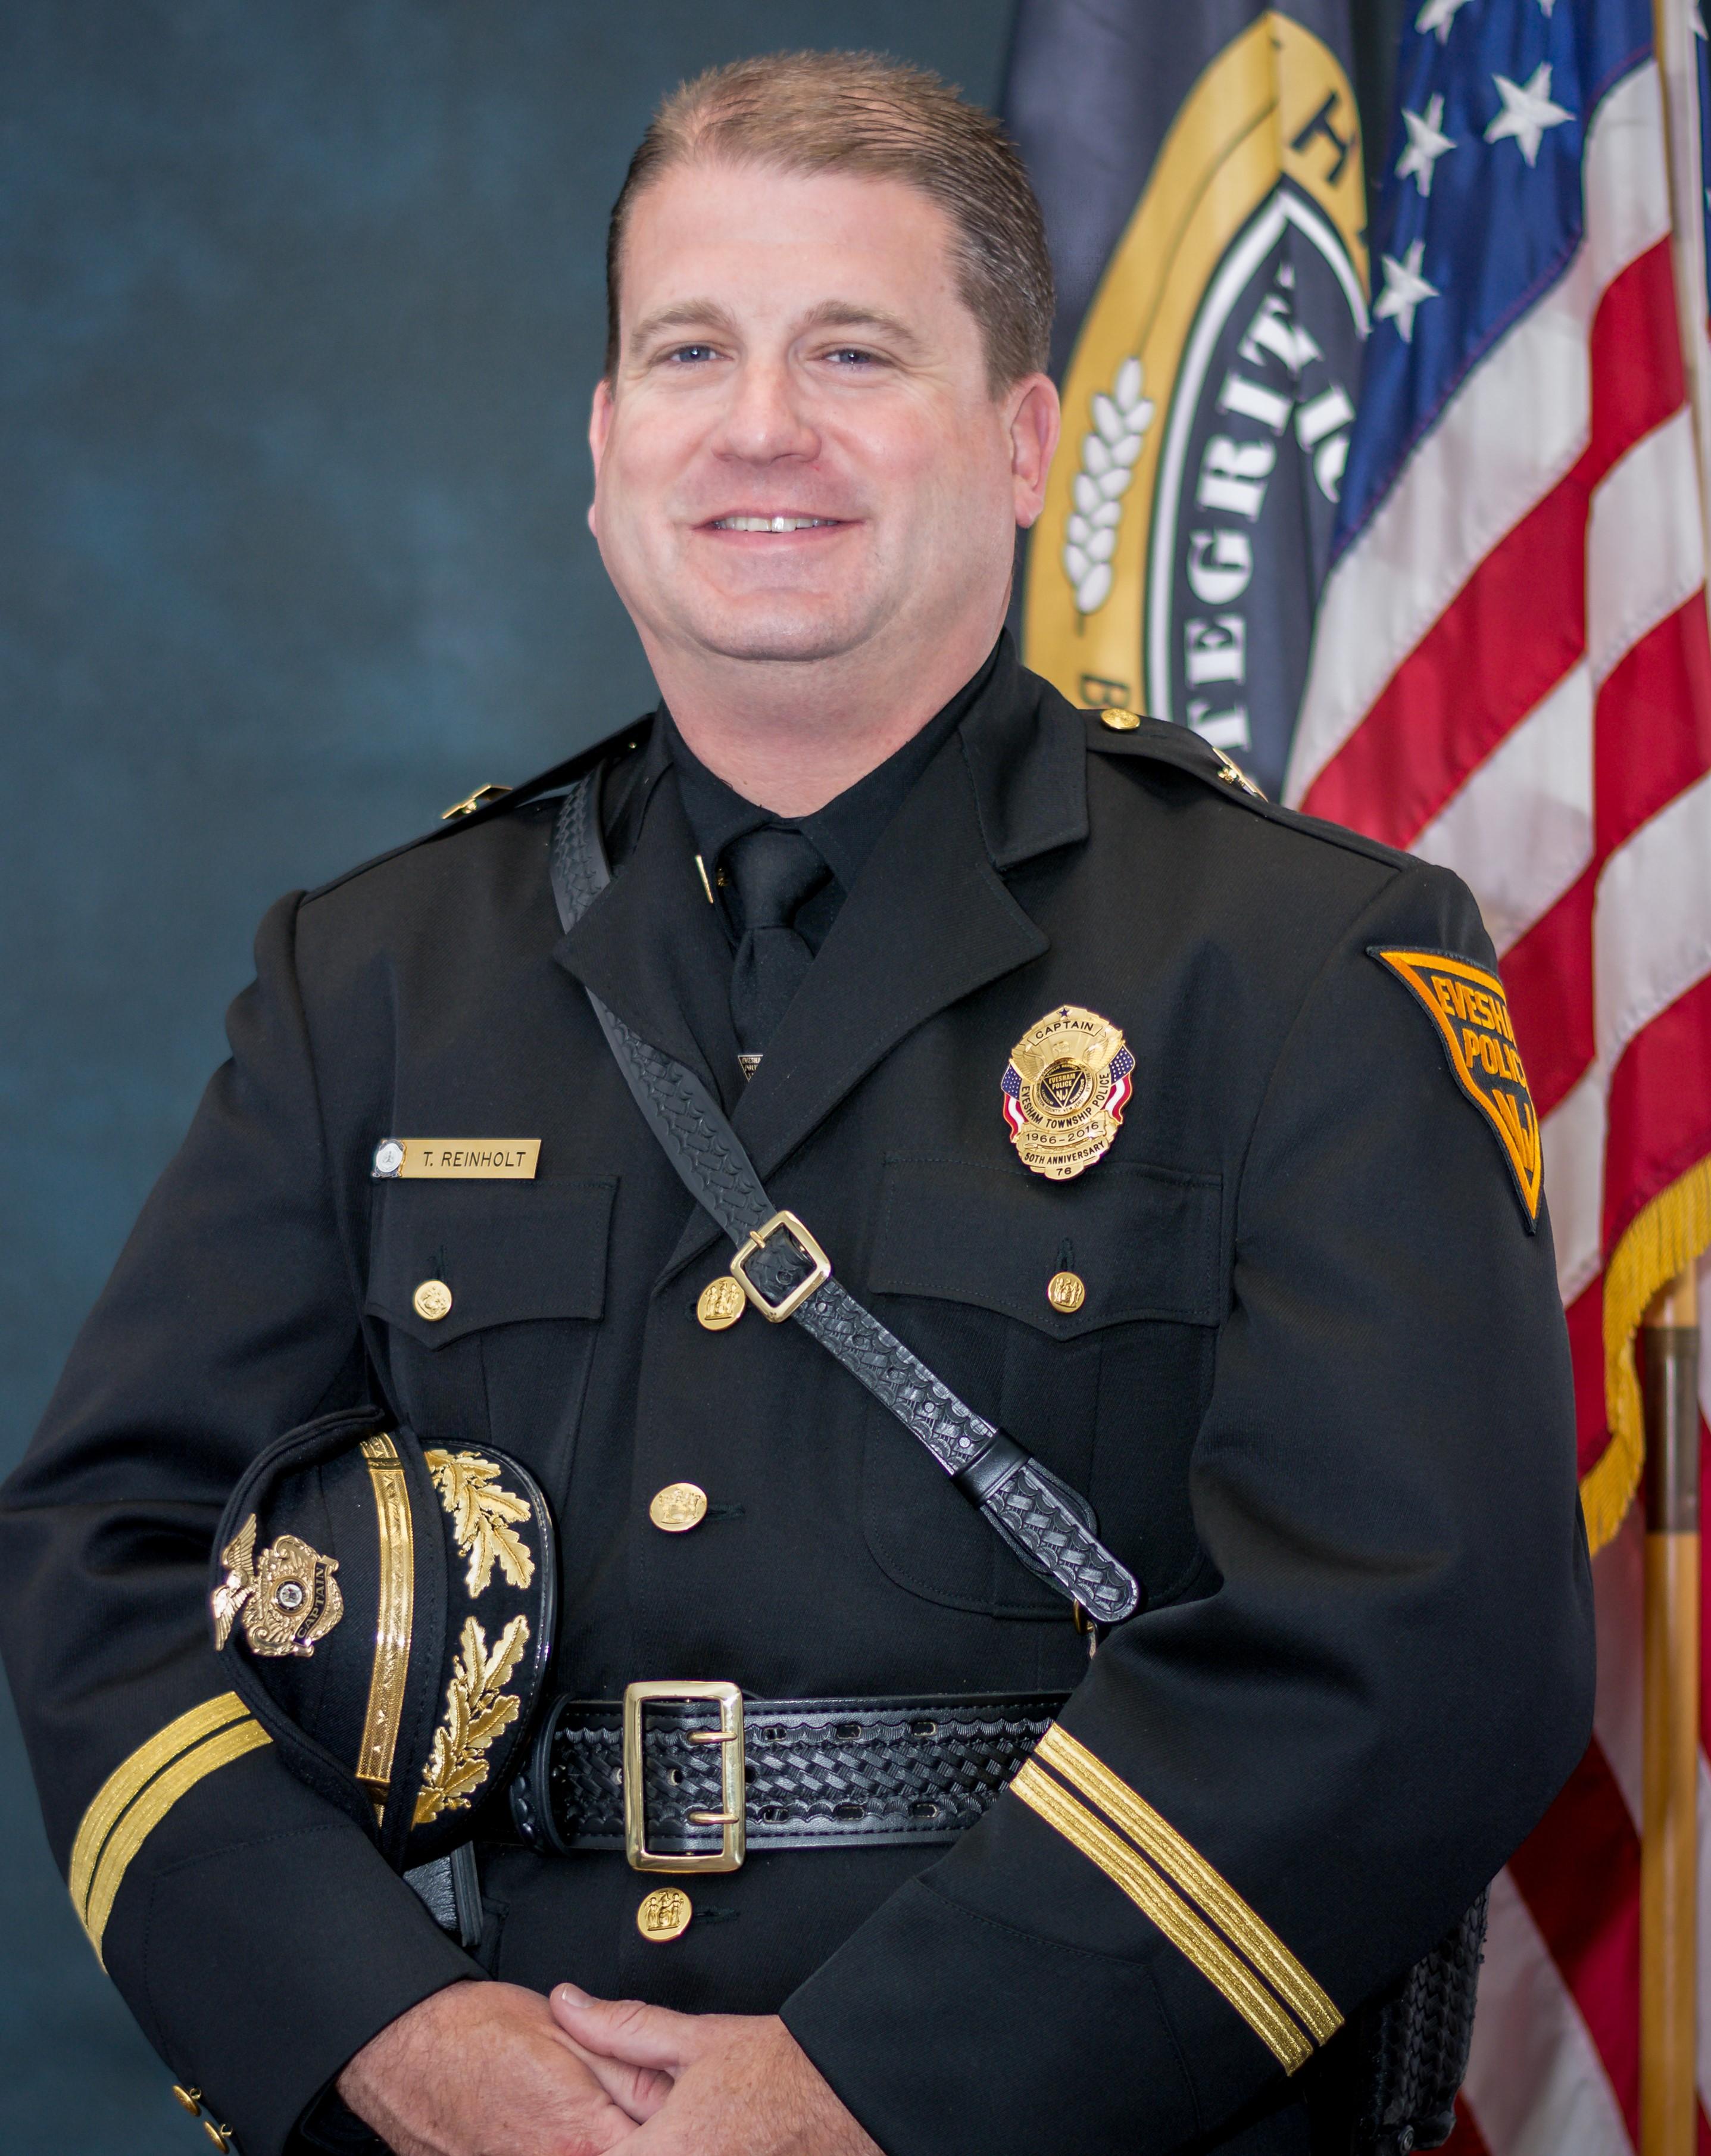 Administrative Division Commander - Captain Thomas Reinholt